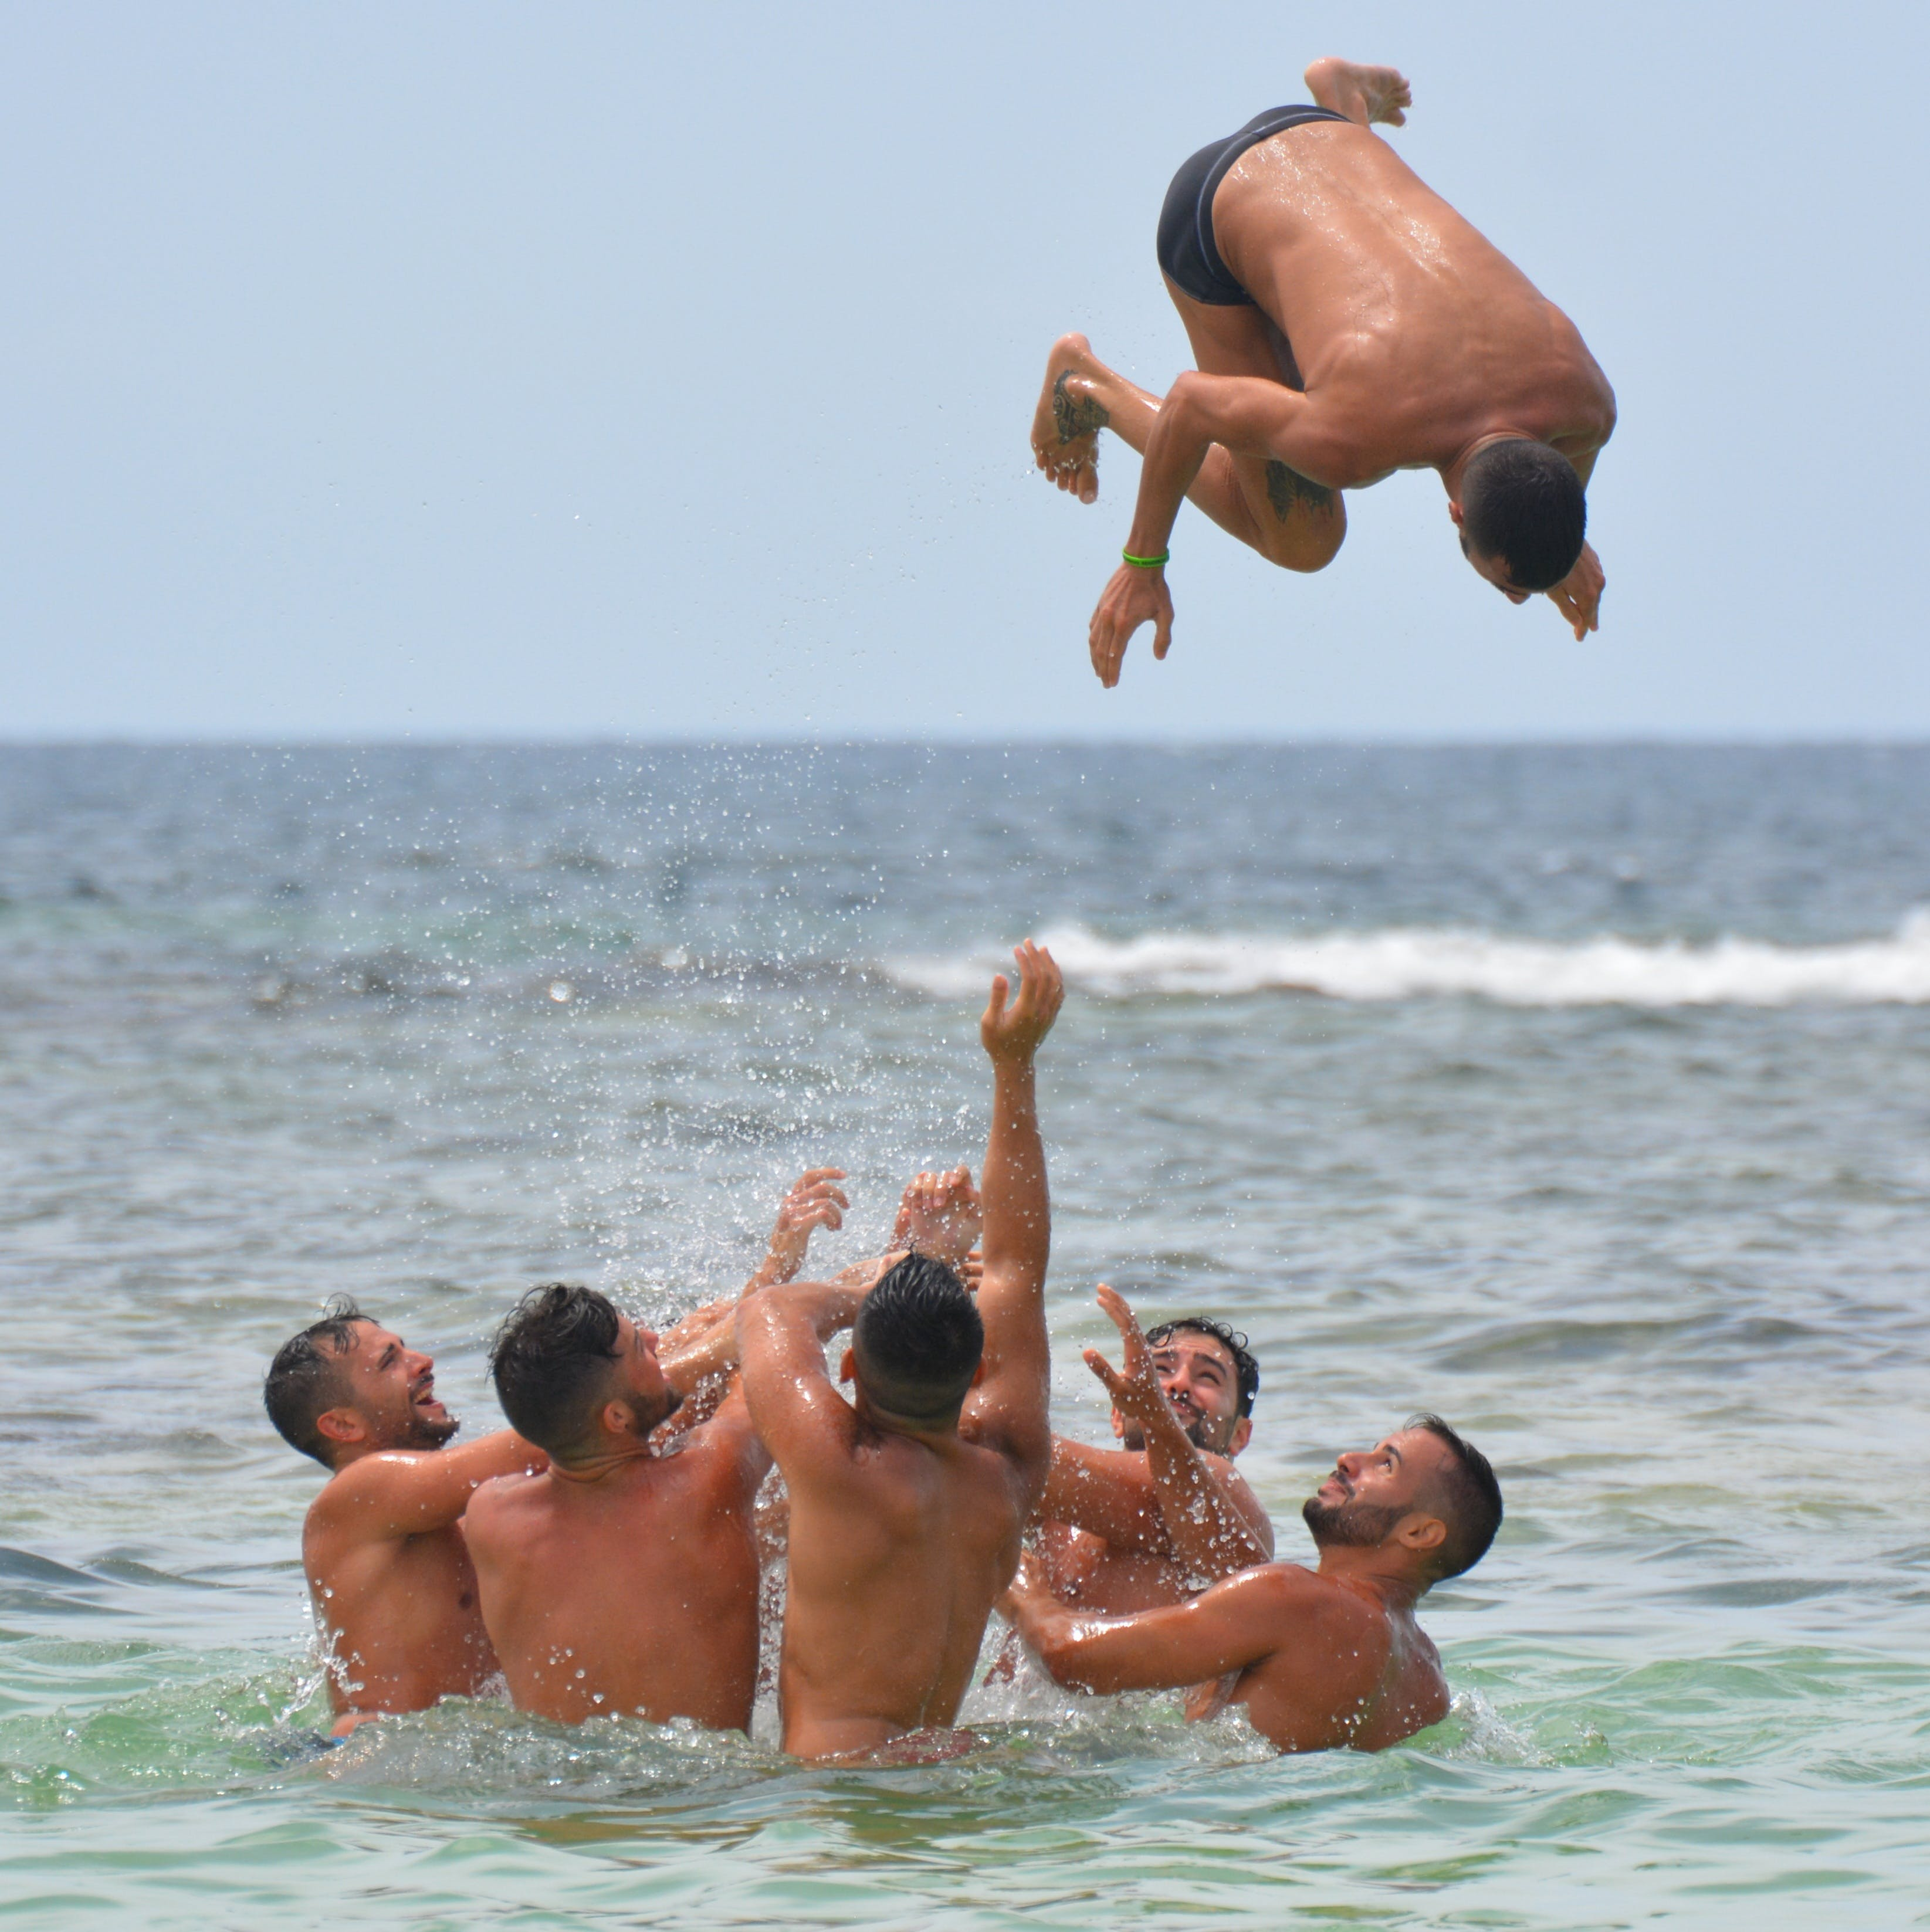 Group of Men in Body of Water